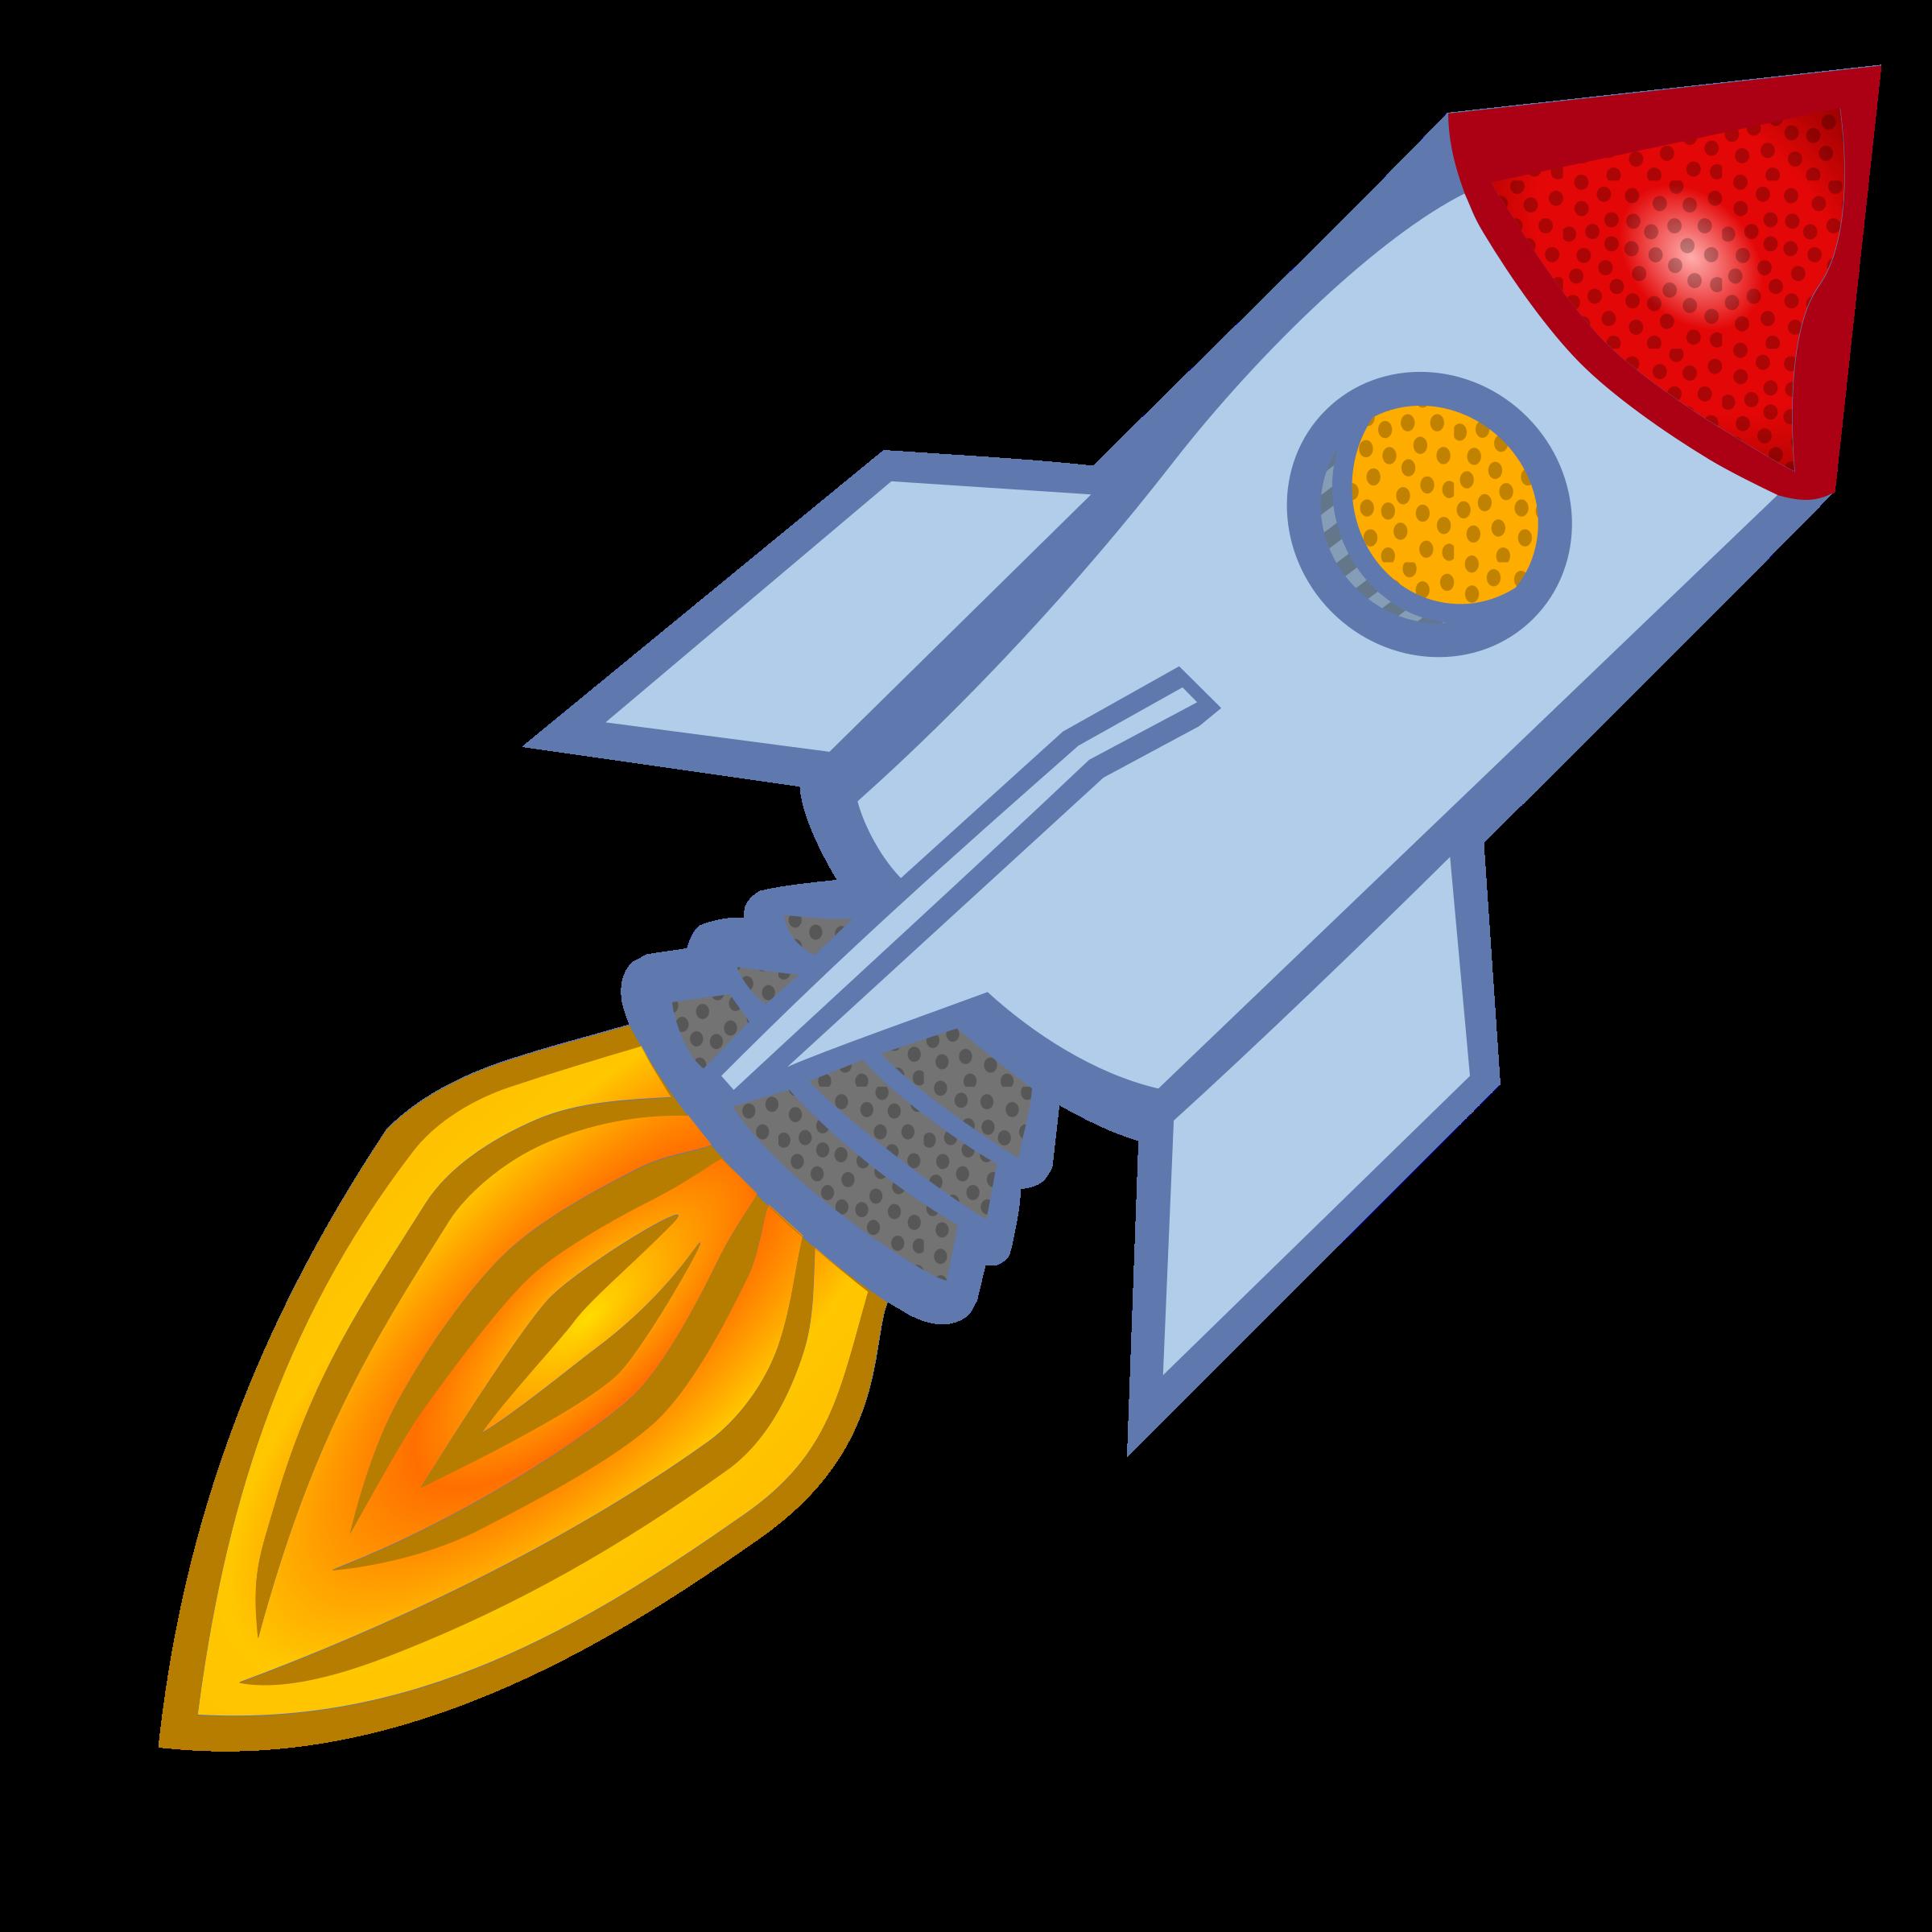 Clipart rocket printable. Coloured big image png